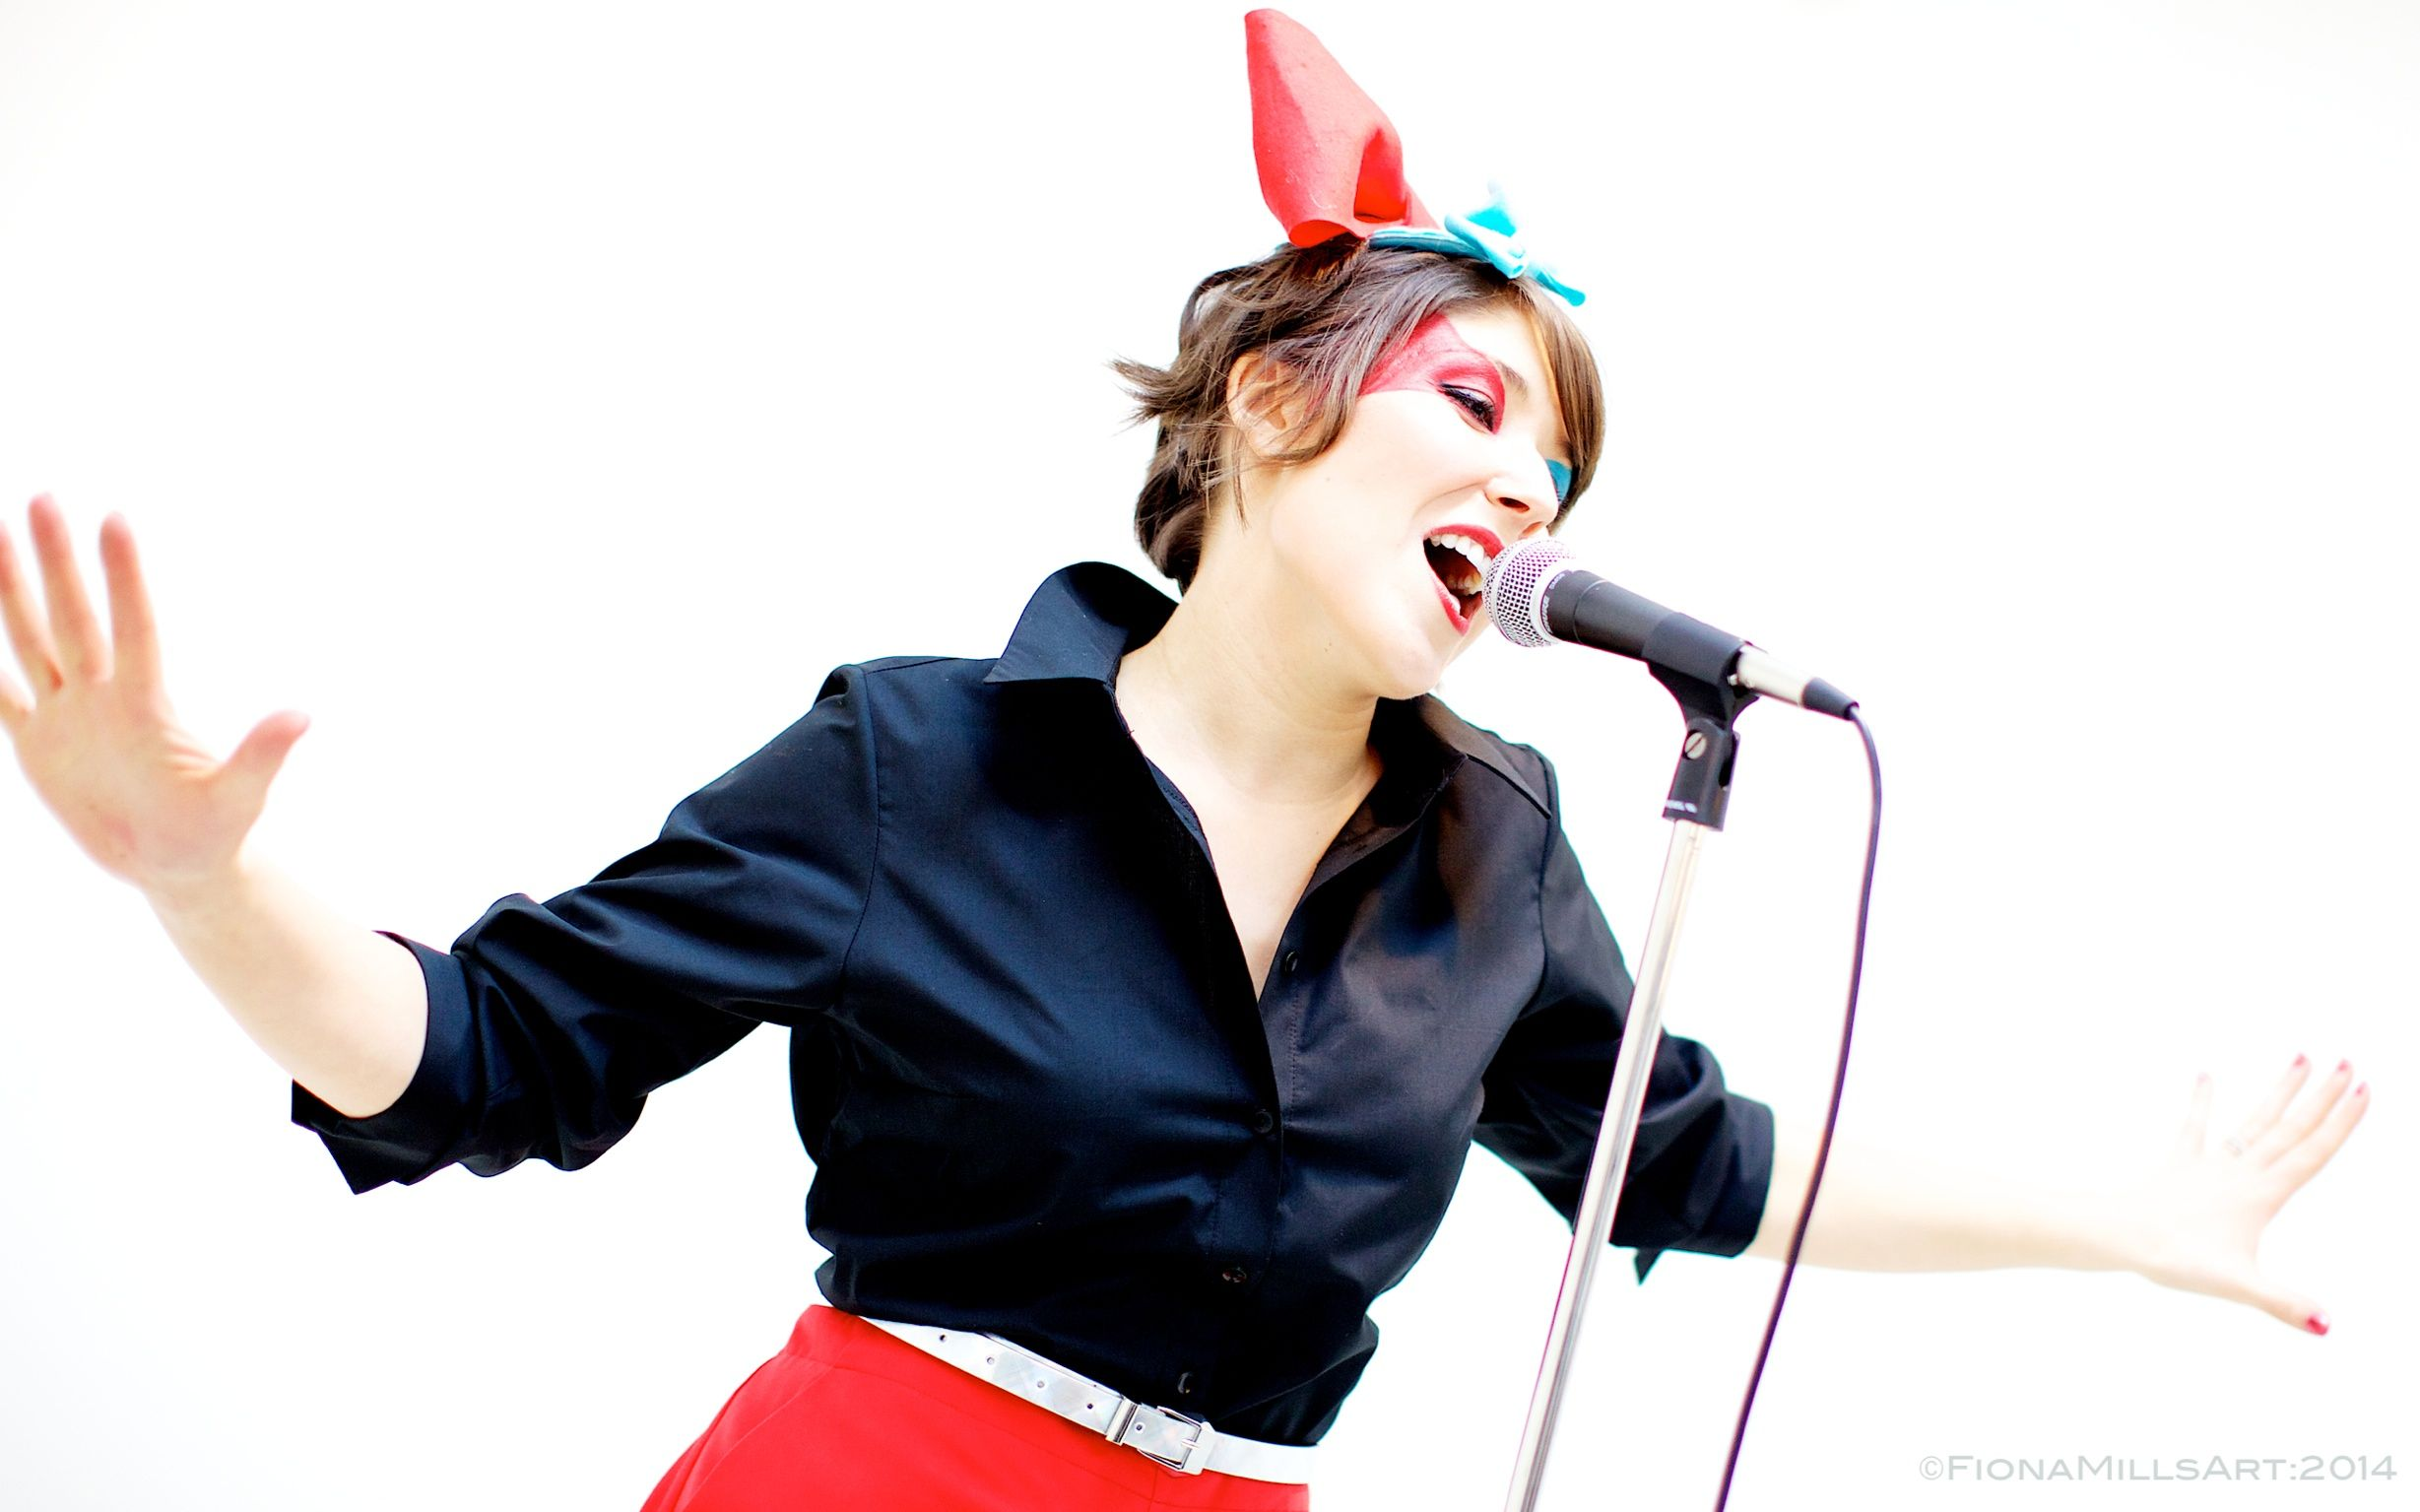 Band promo pics. Lead singer, lady vocalist. High key high